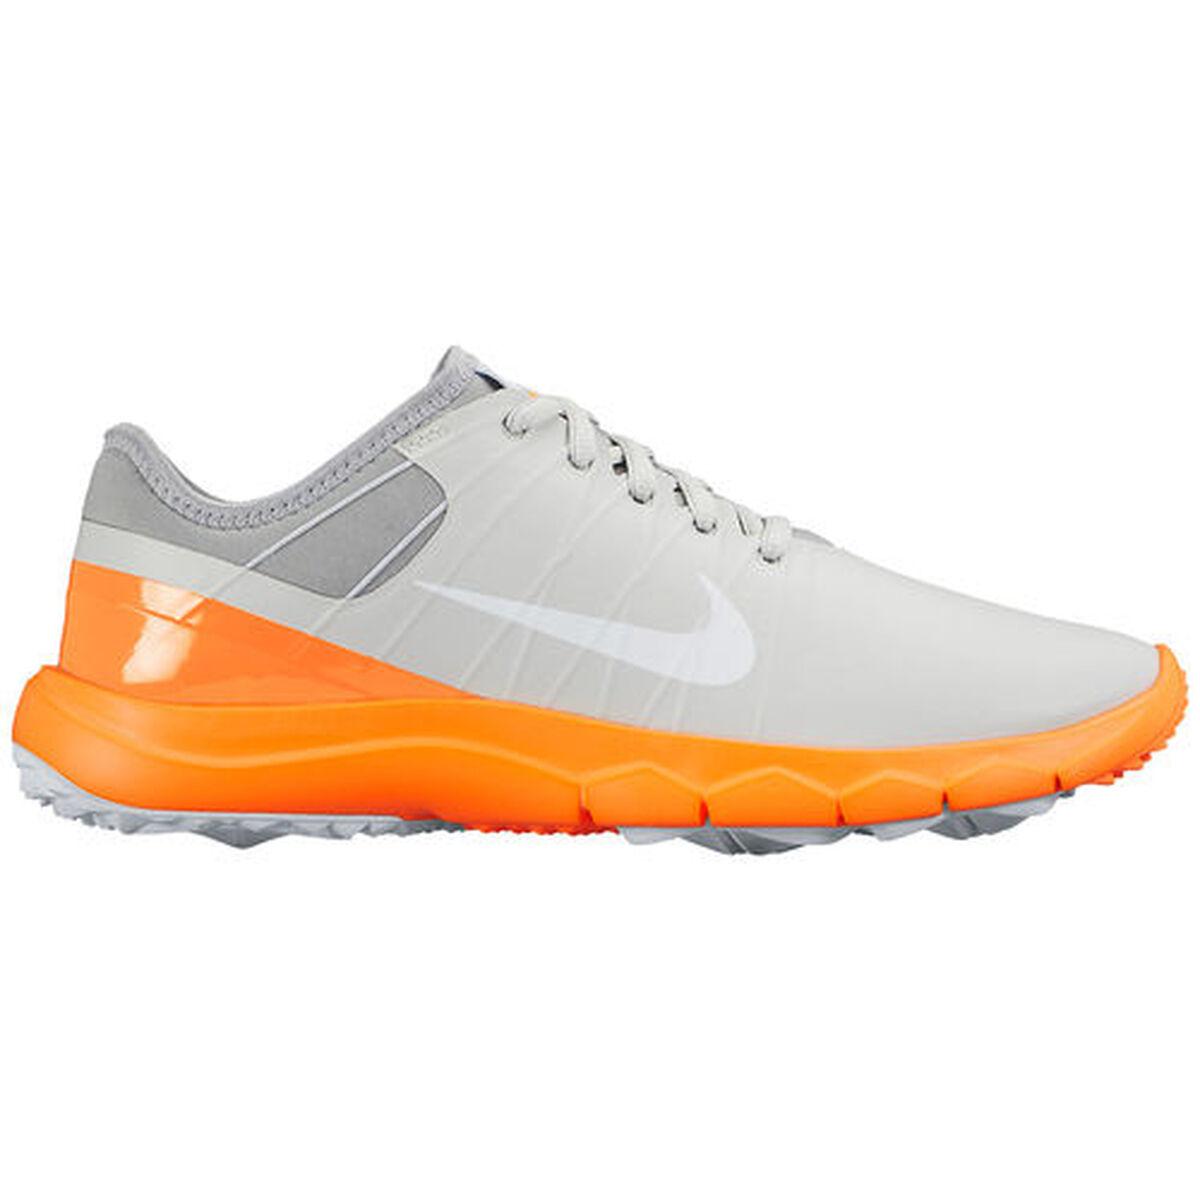 ef09db3385c Images. Nike FI Impact 2 Women  39 s Golf Shoe ...